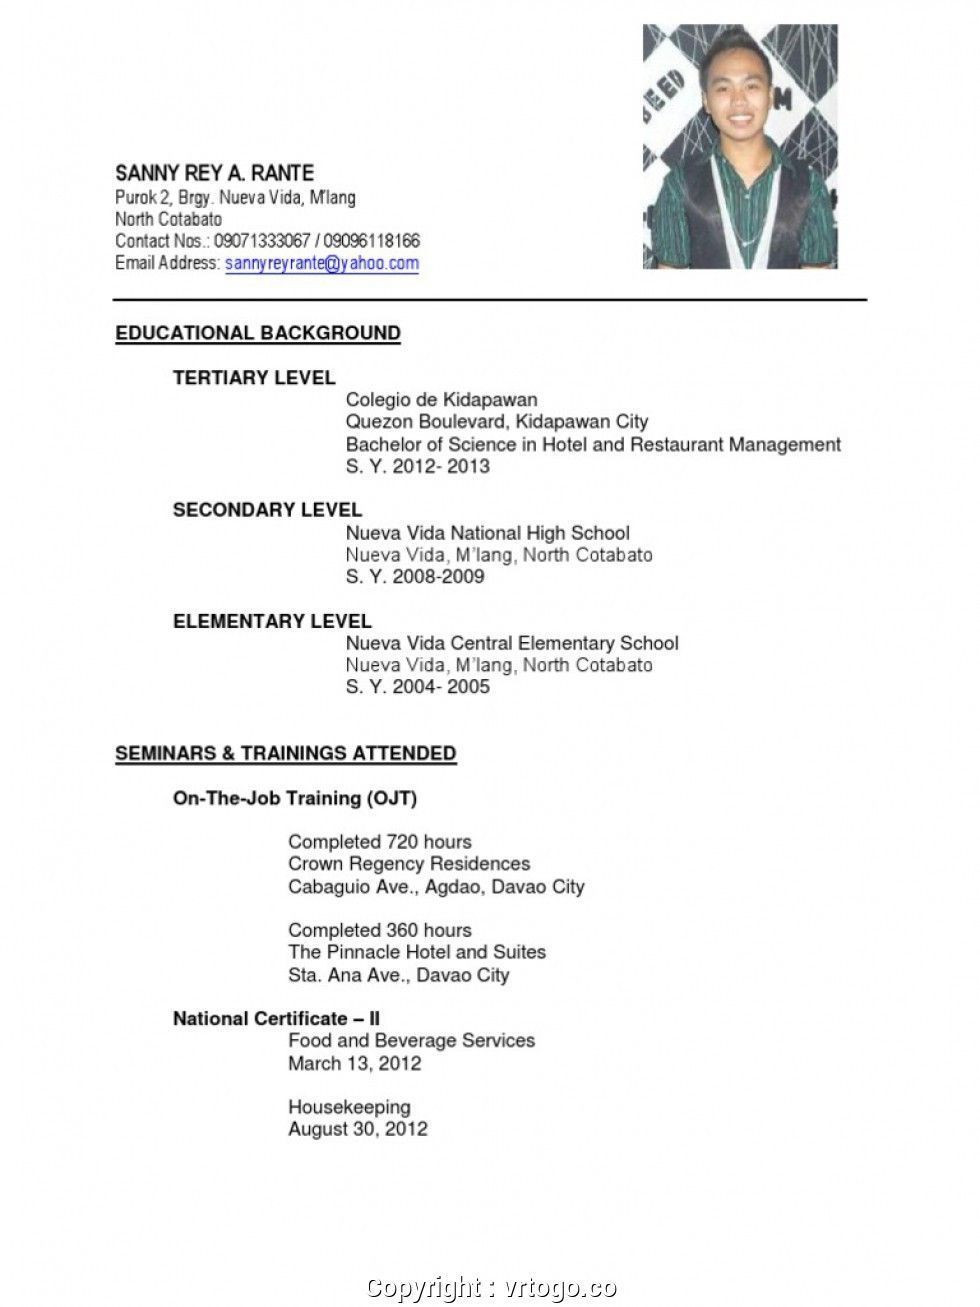 Sample Resume for Hotel and Restaurant Management Fresh Graduate Simply Sample Resume for Hrm Fresh Graduates Job Application ...